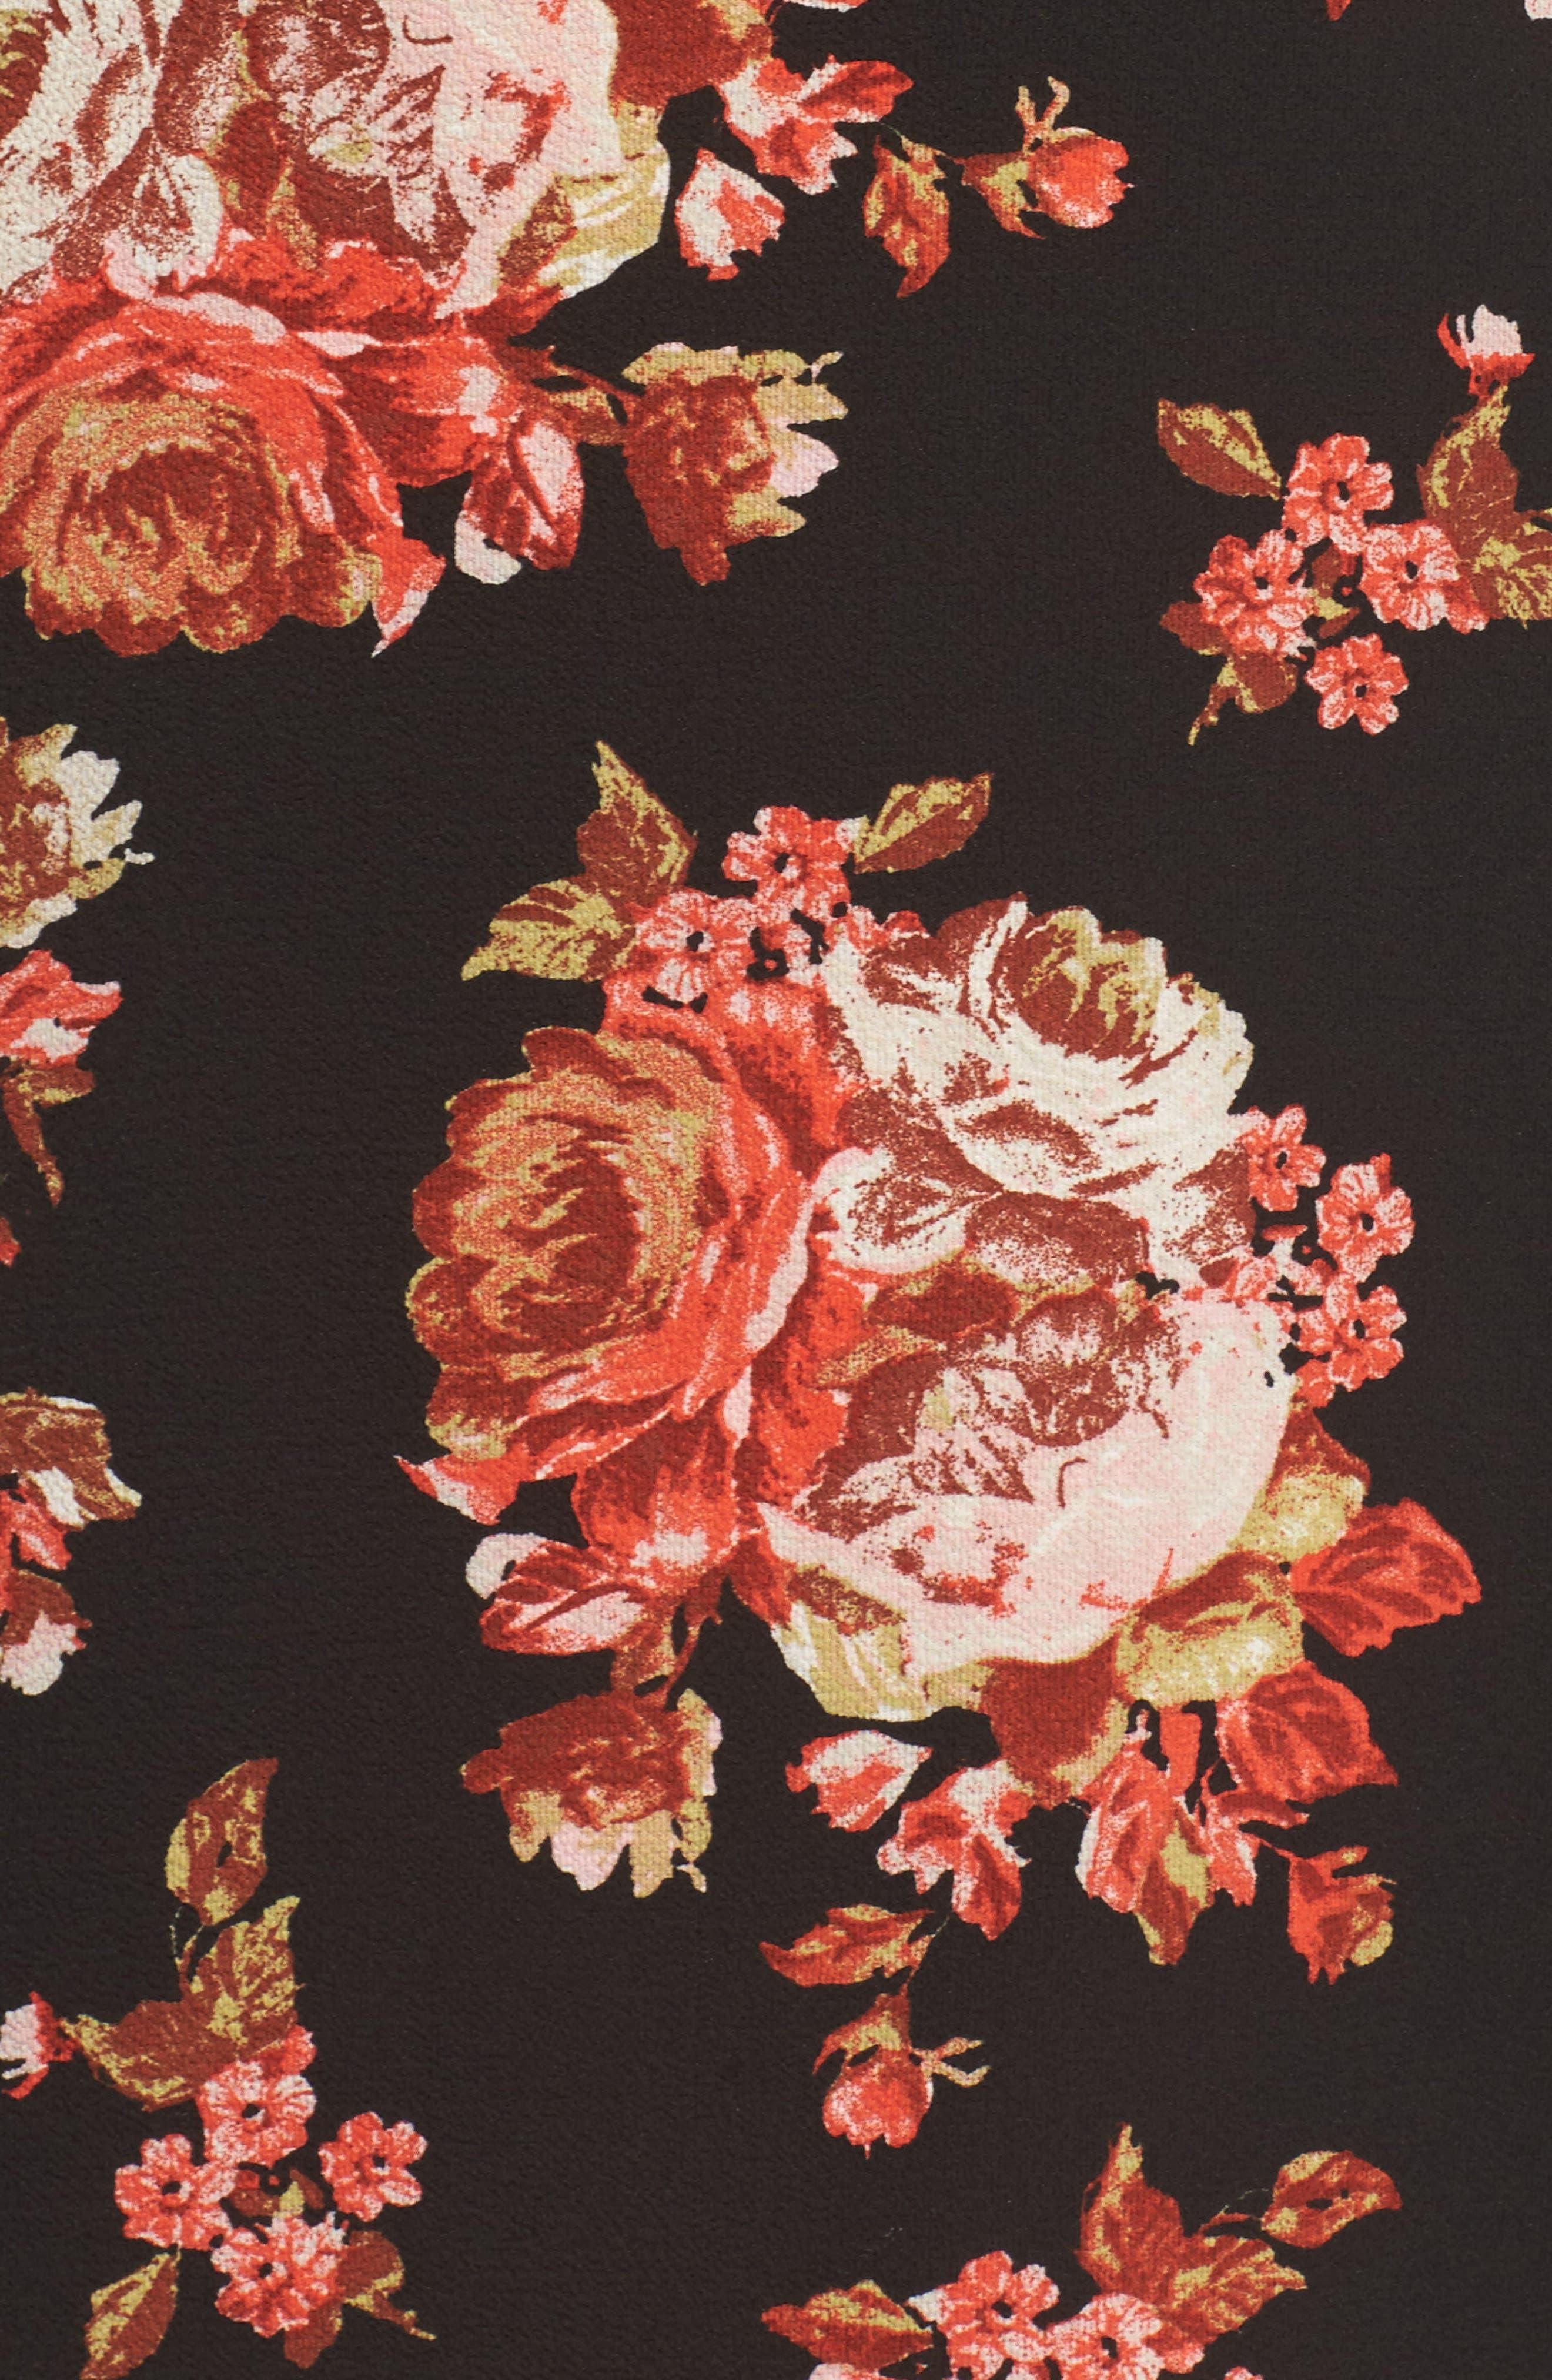 V-Neck Floral Print Dress,                             Alternate thumbnail 5, color,